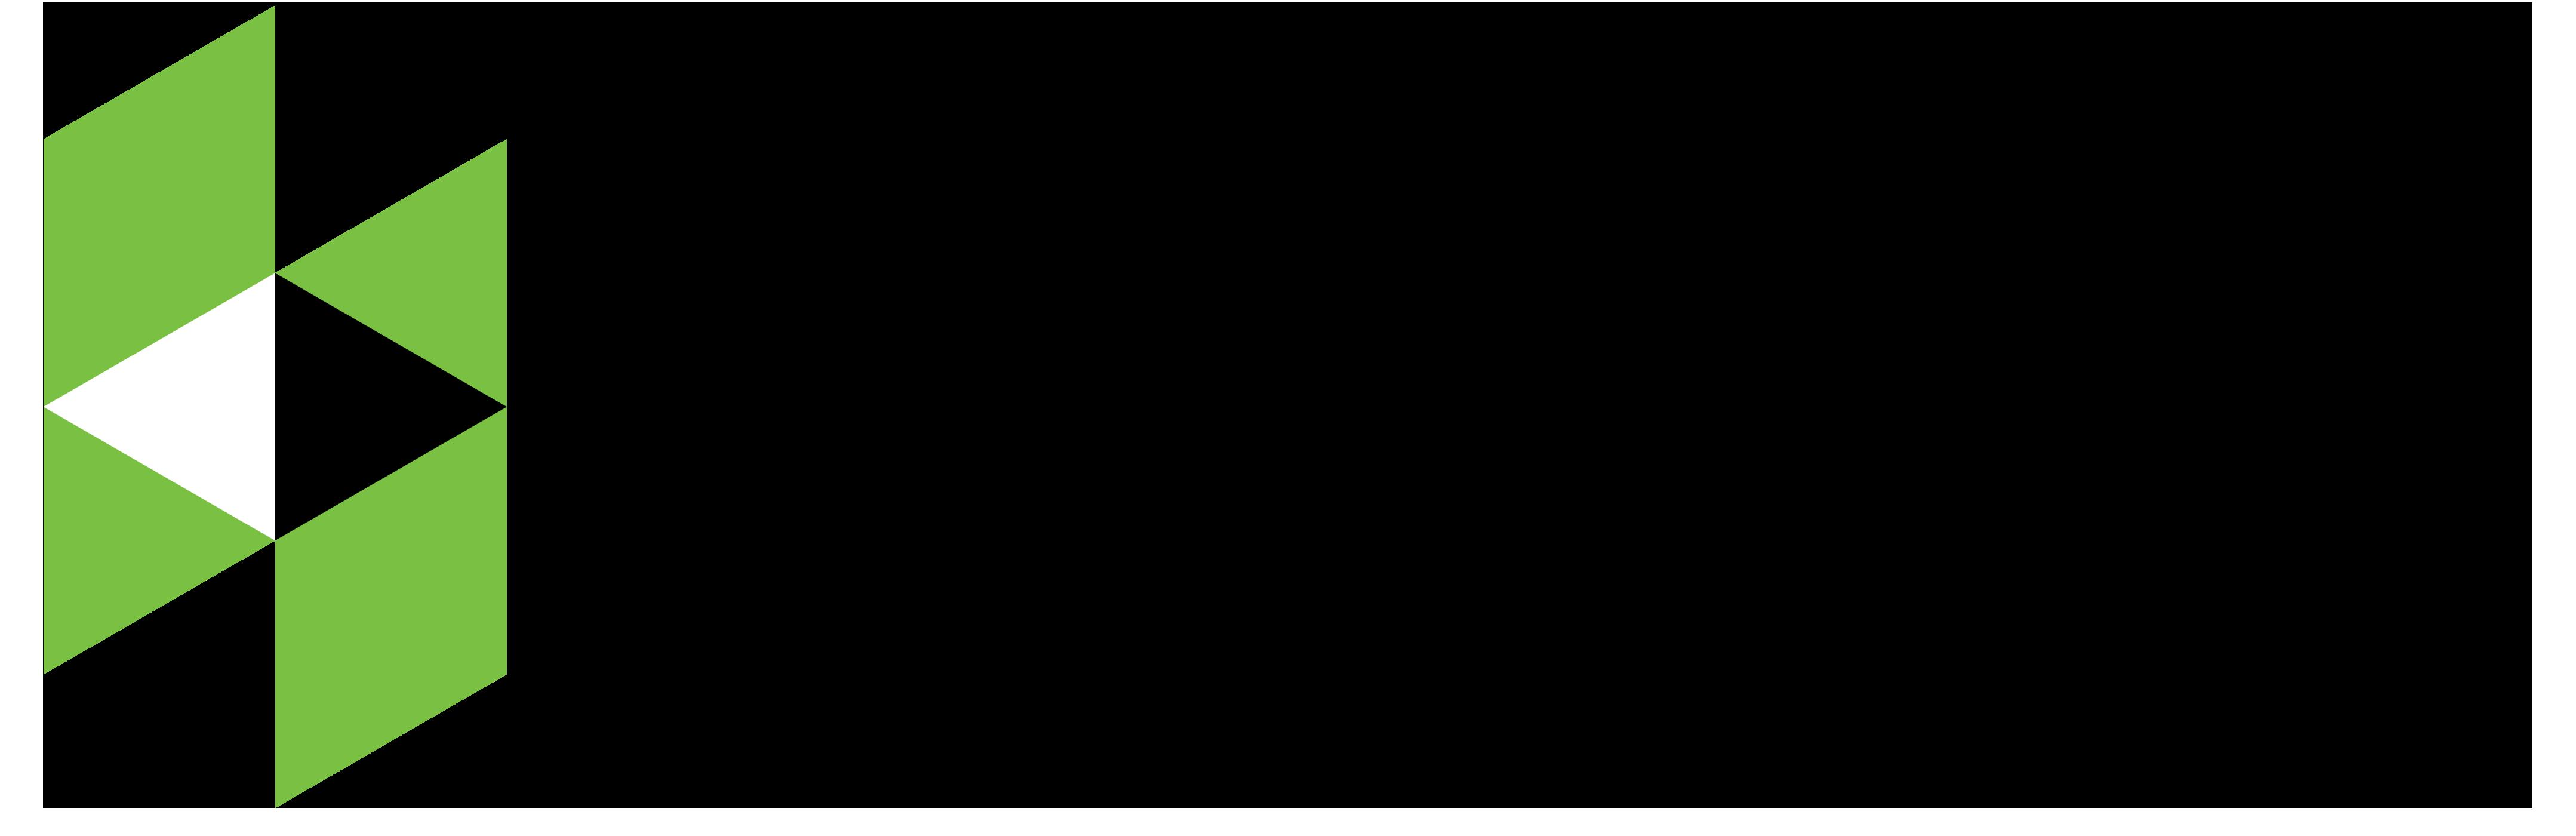 Houzz_logo_logotype